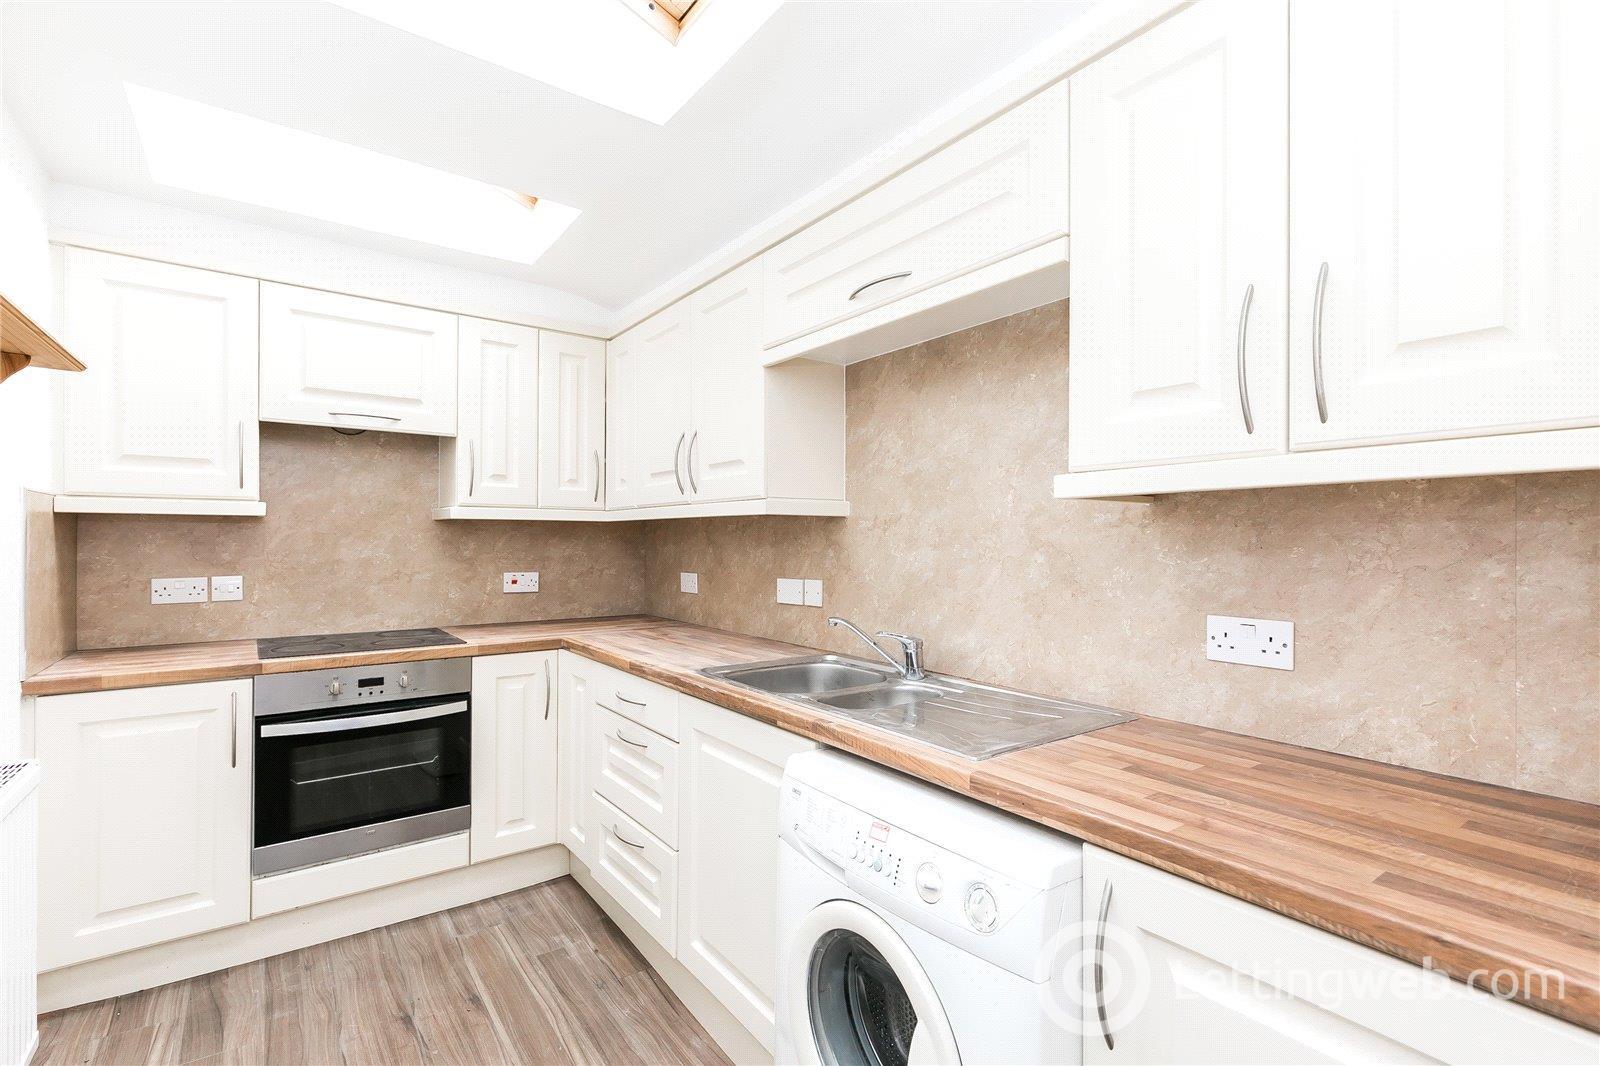 Property to rent in 59 Newbank, Gardenstown, Banff, AB45